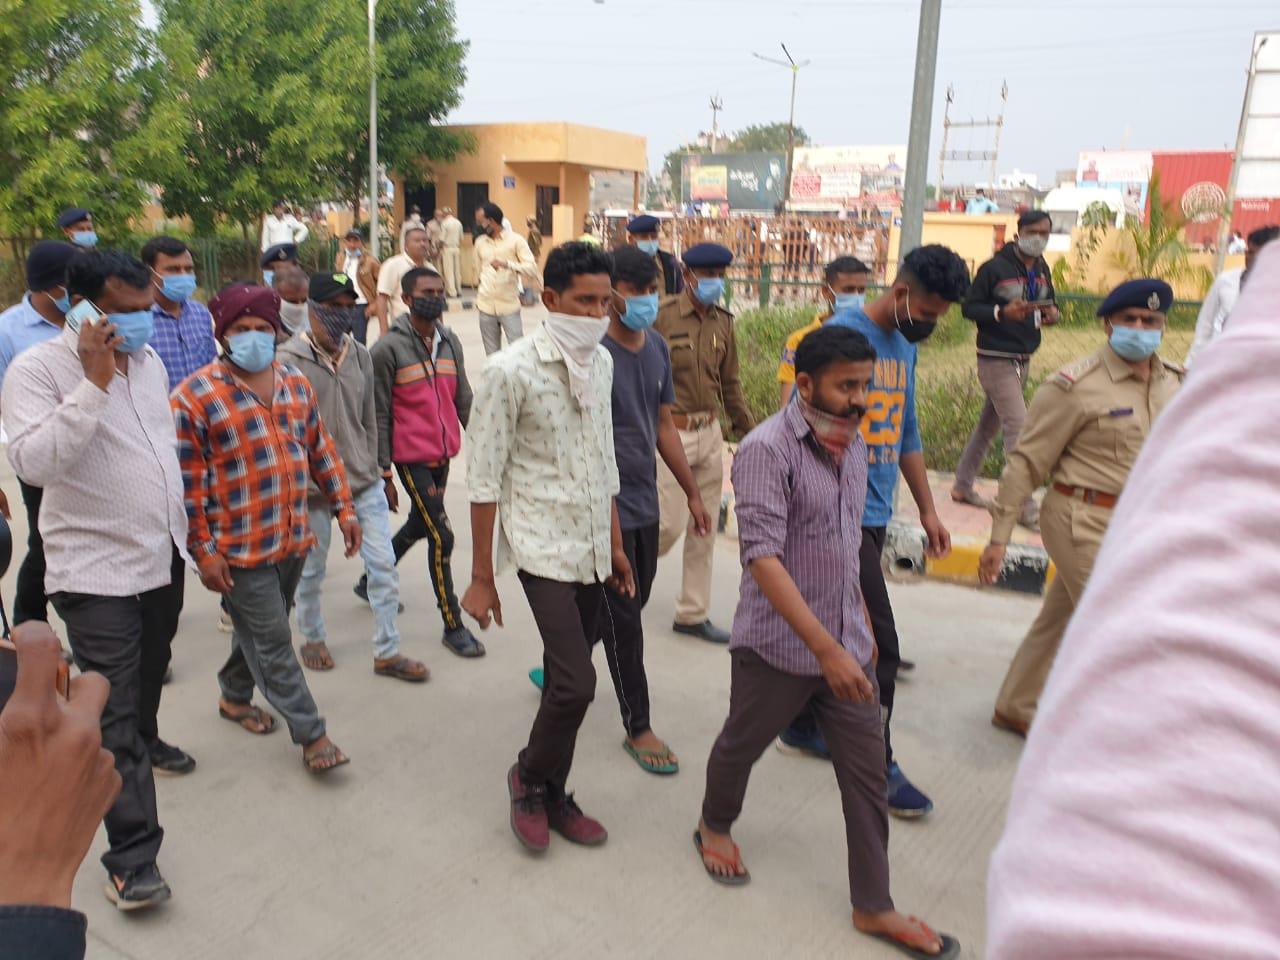 #Panchmahal - ગોચરની જમીનમાં ખોટી રીતે એન્ટ્રી પડાતા આઠ લોકો આત્મવિલોપન કરવા કલેકટર કચેરી પહોંચ્યા